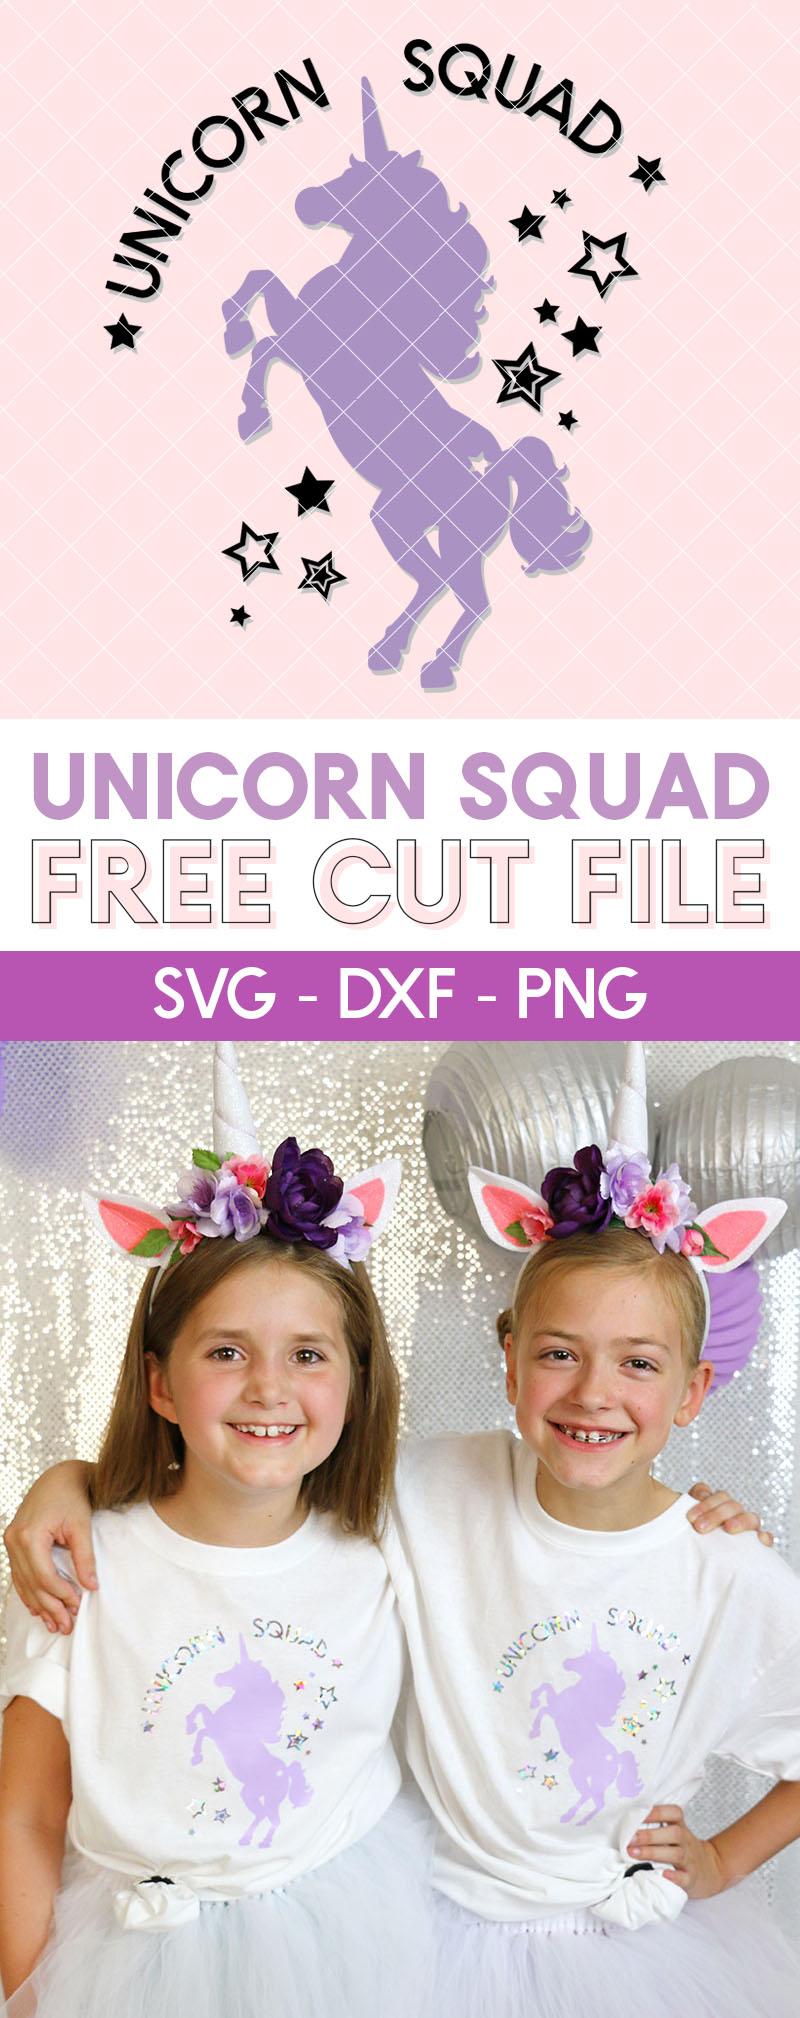 unicorn squad free cut file